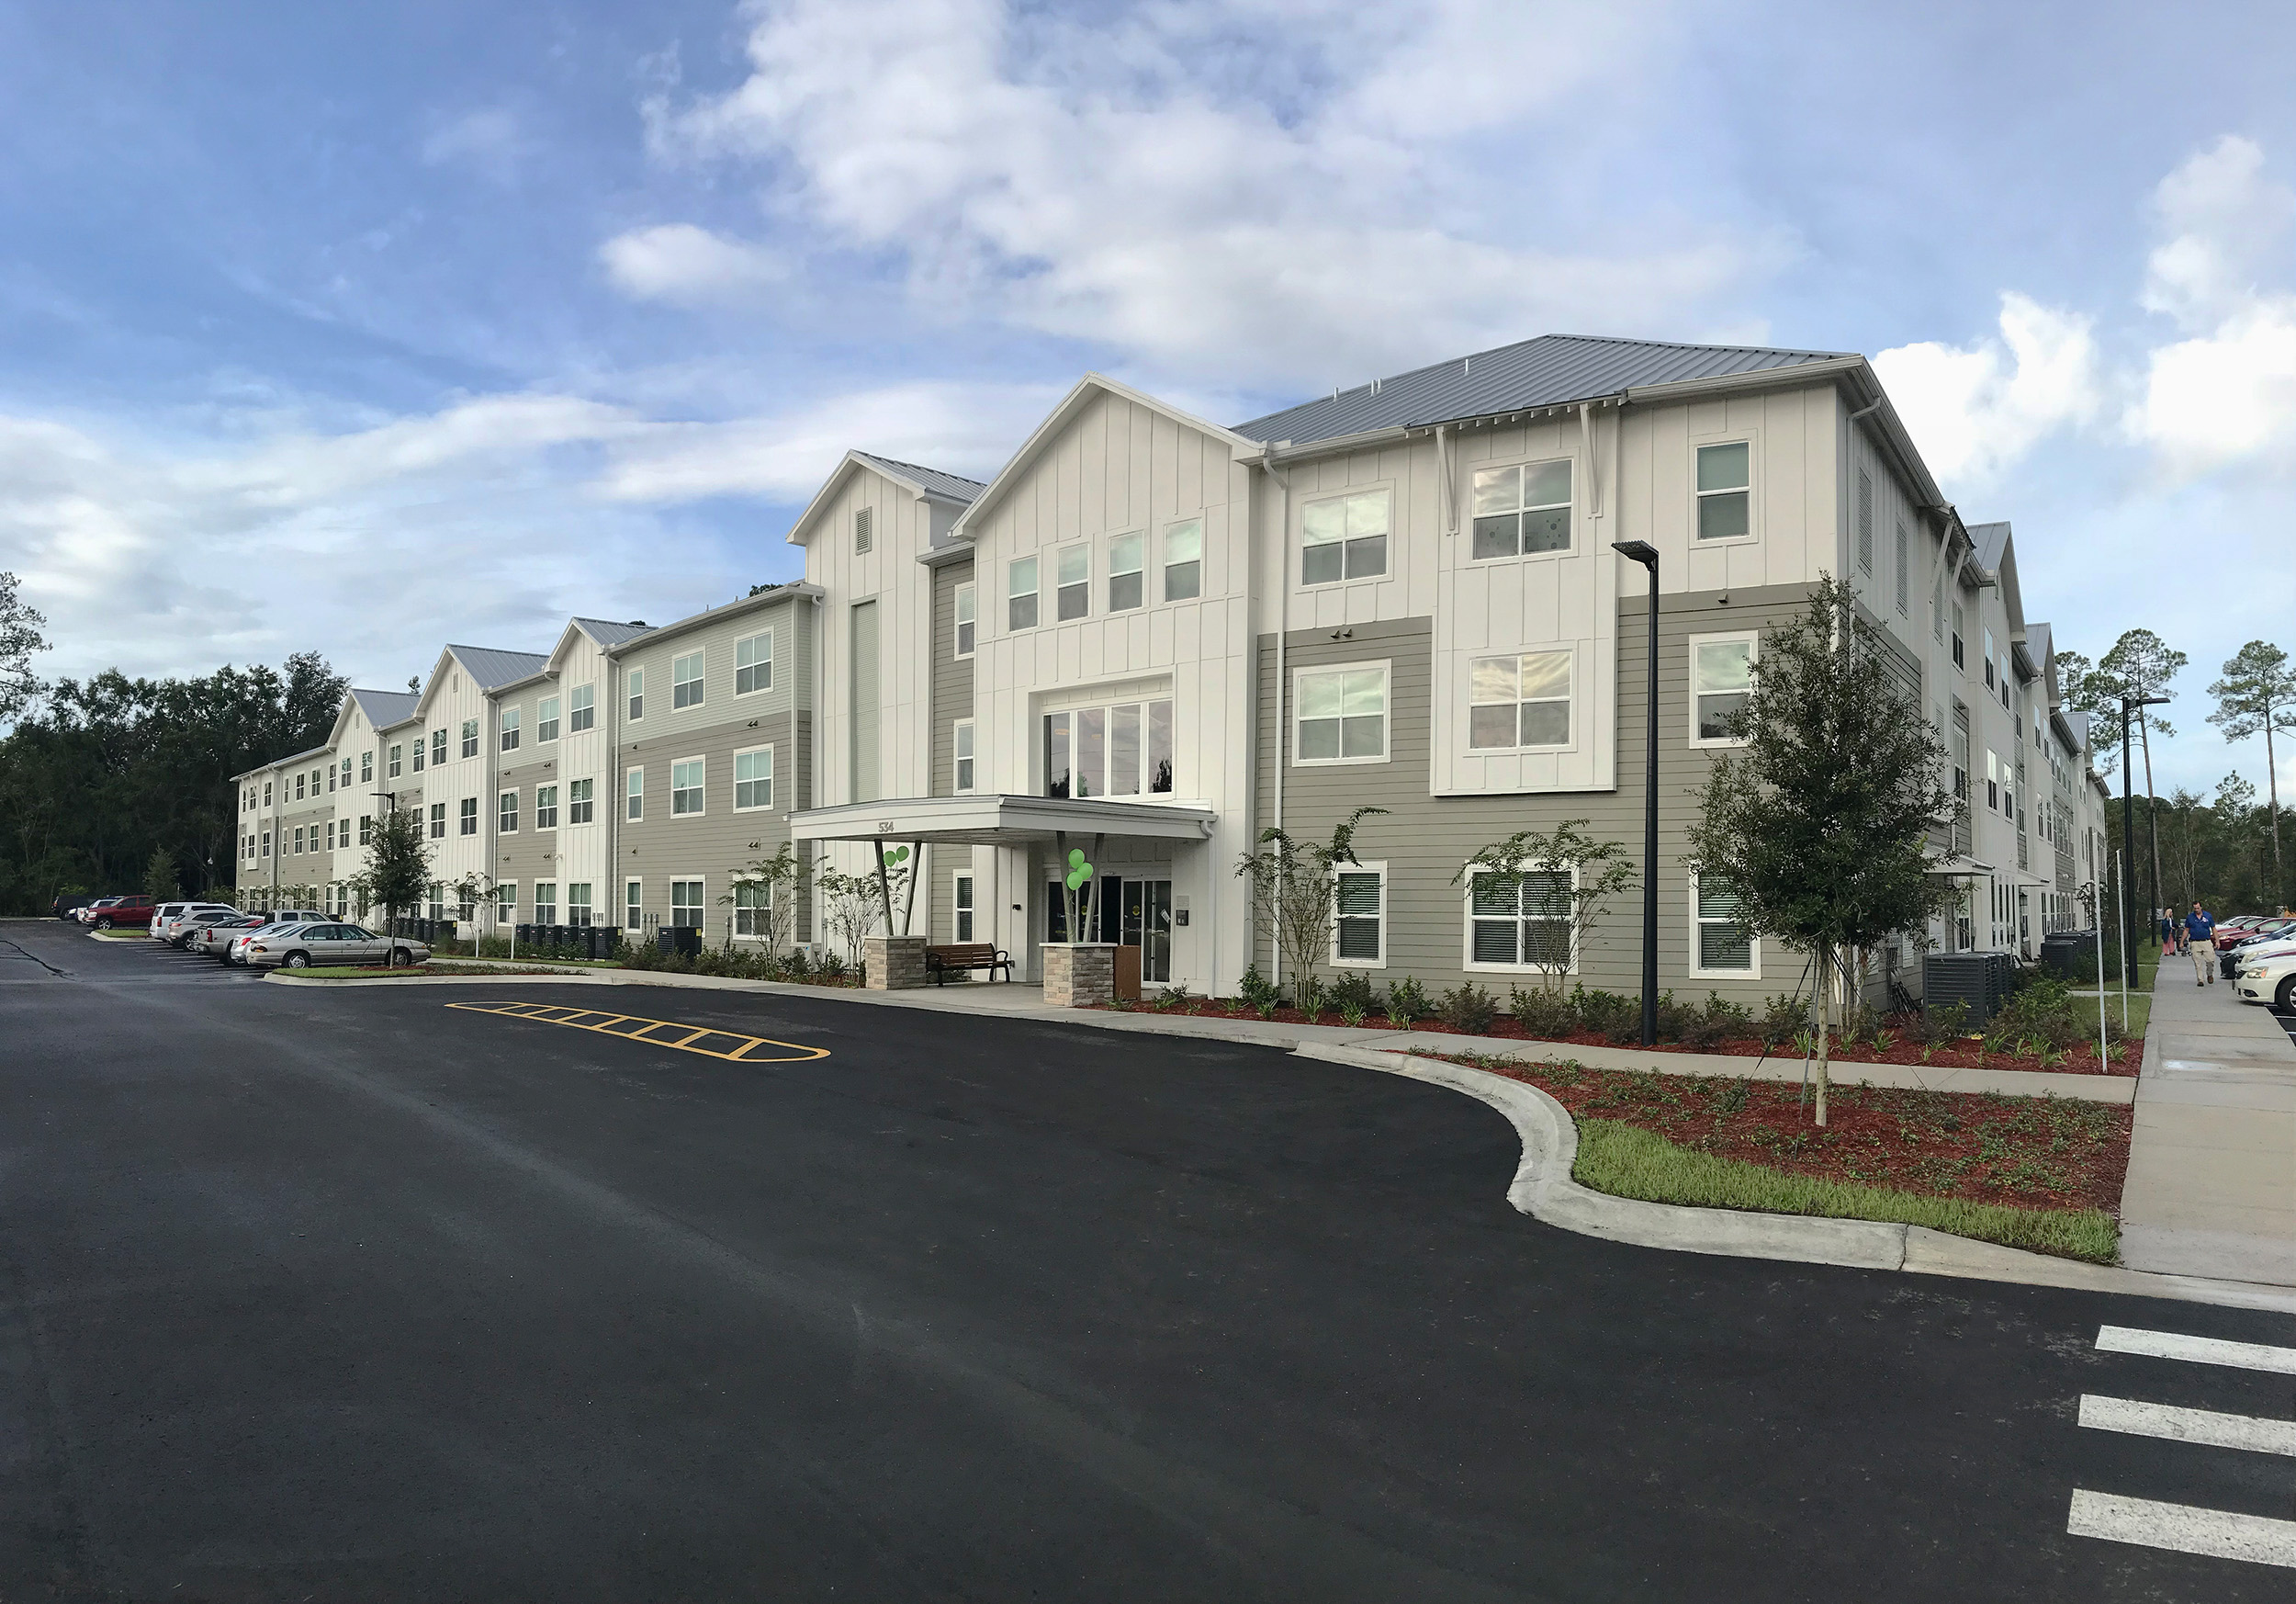 Multi story senior living apartments front entrance